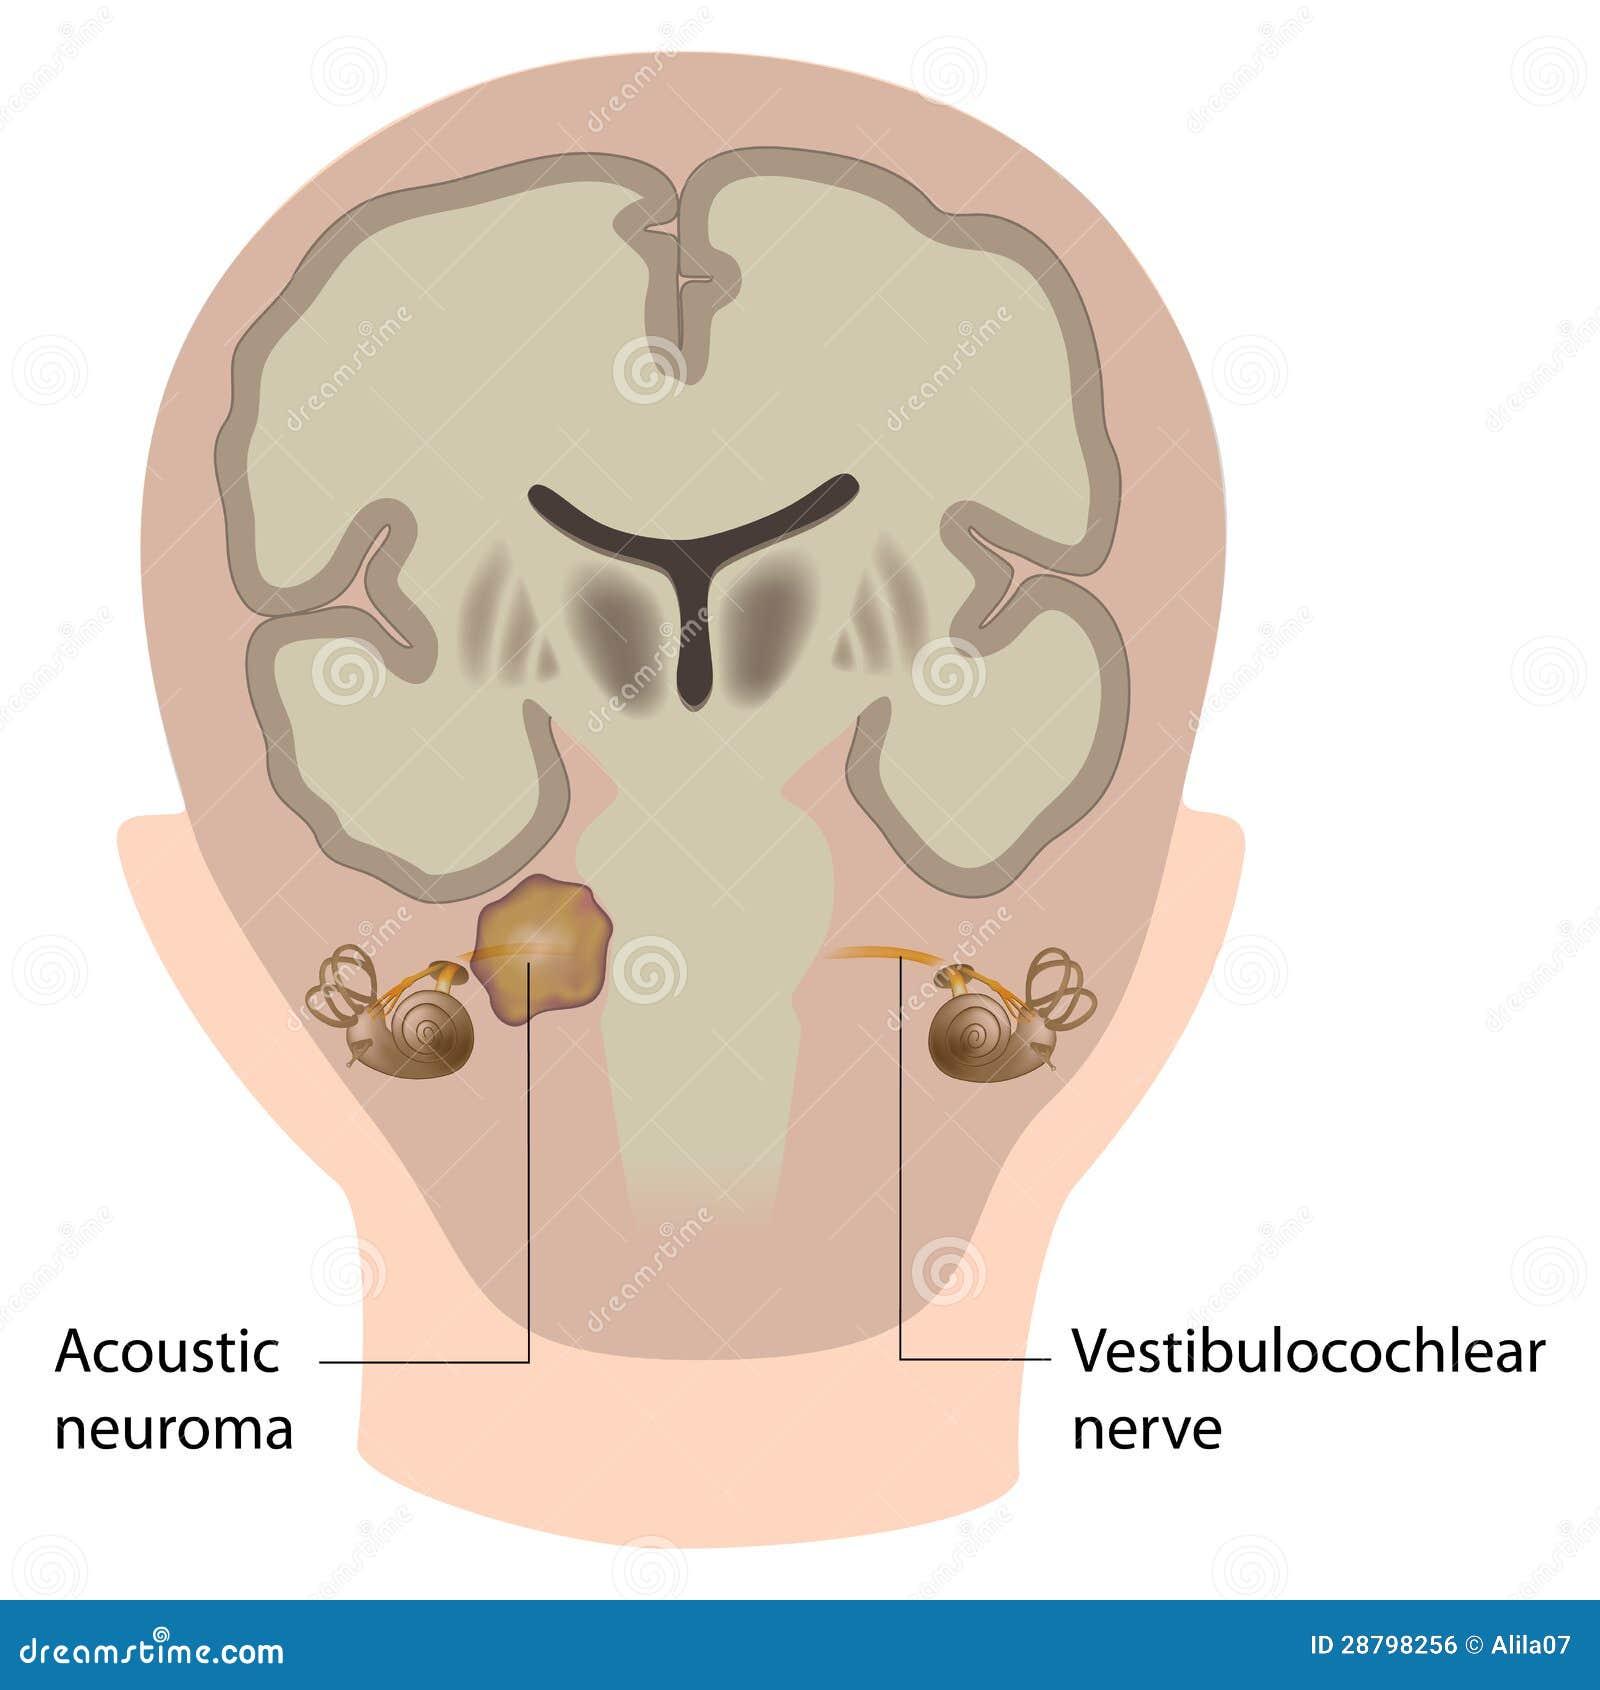 неврома фото